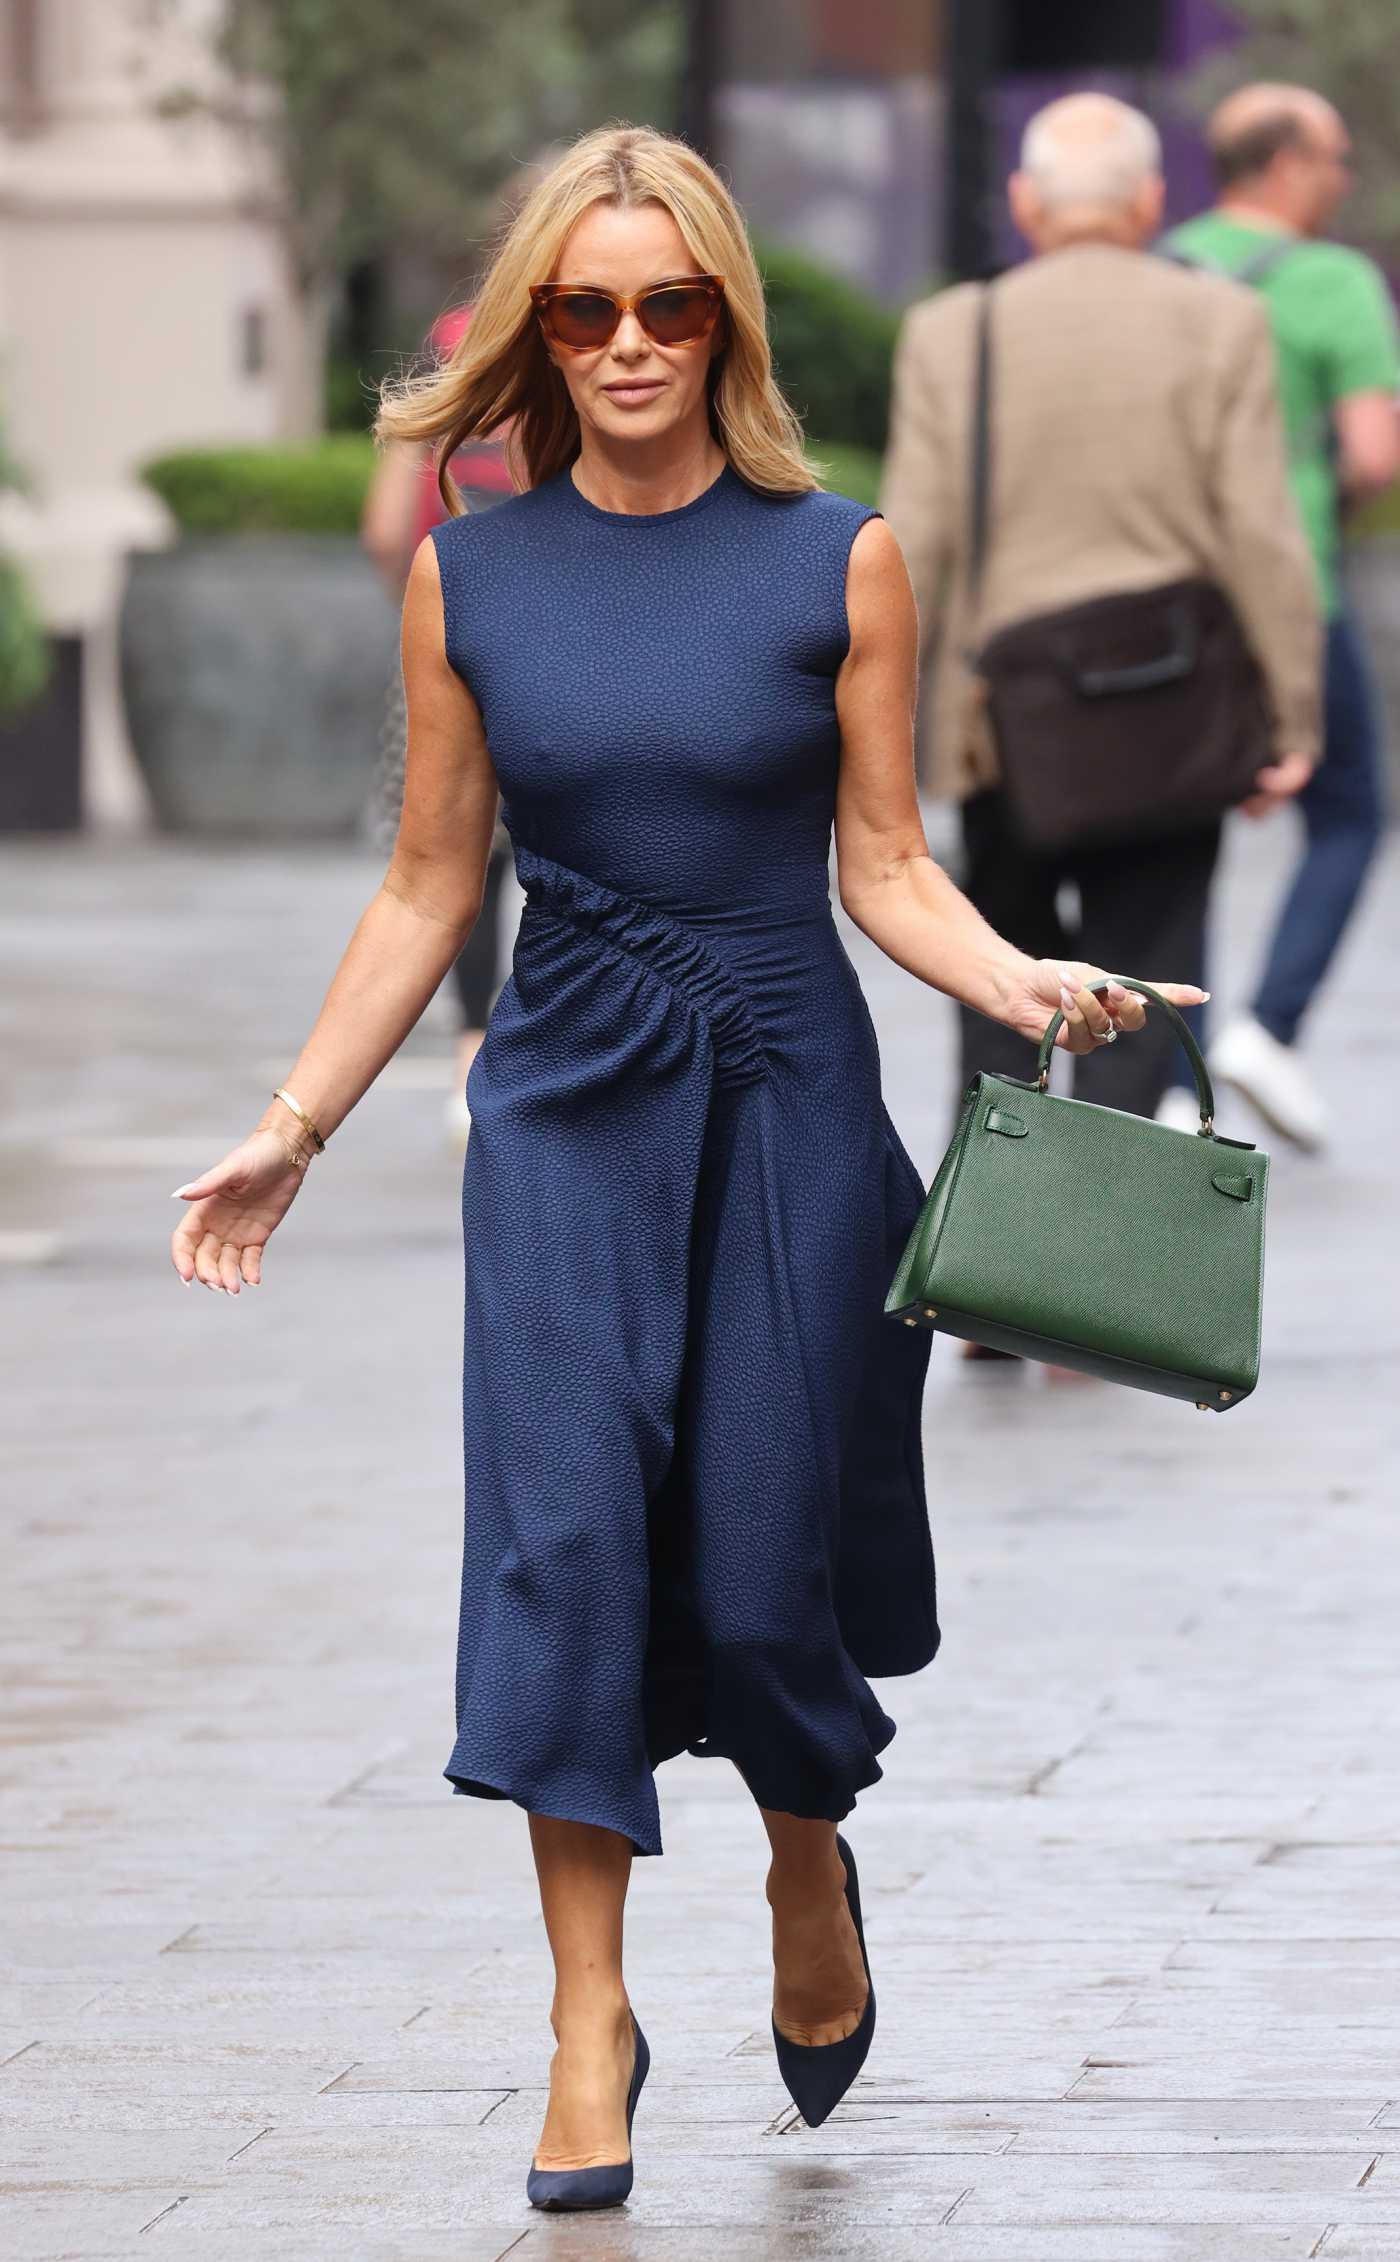 Amanda Holden in a Blue Dress Leaves the Global Radio Studios in London 09/17/2021